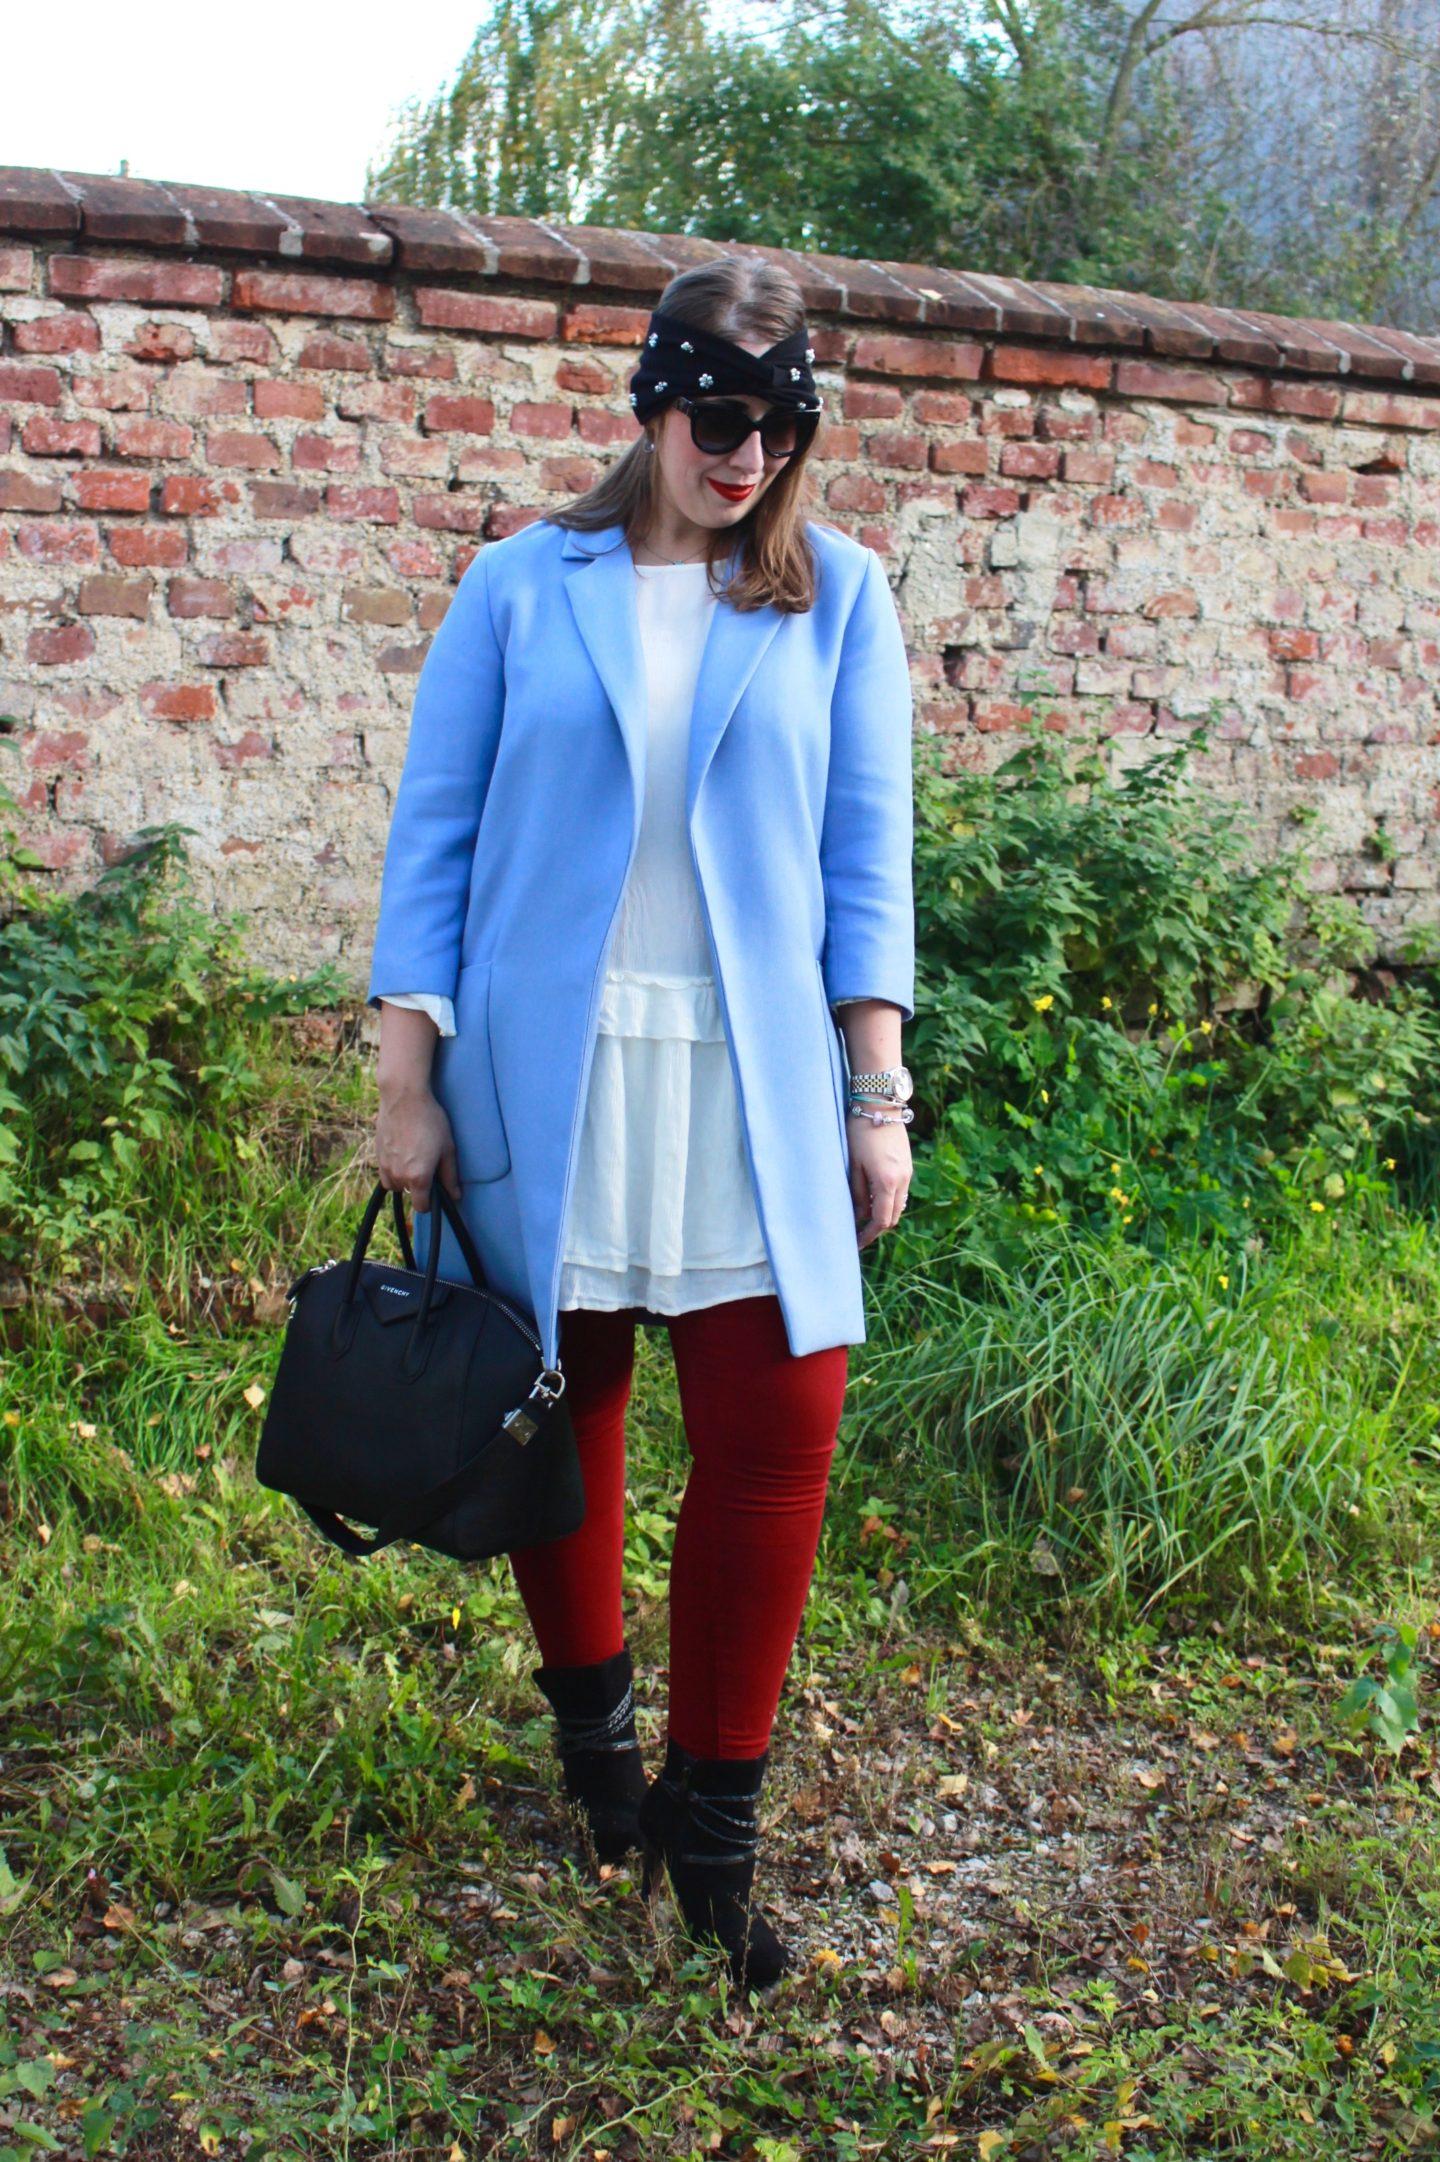 outfit-bordeauxrote-jeans-himmelblauer-mantel-perlen-stirnband-und-givenchy-antigona